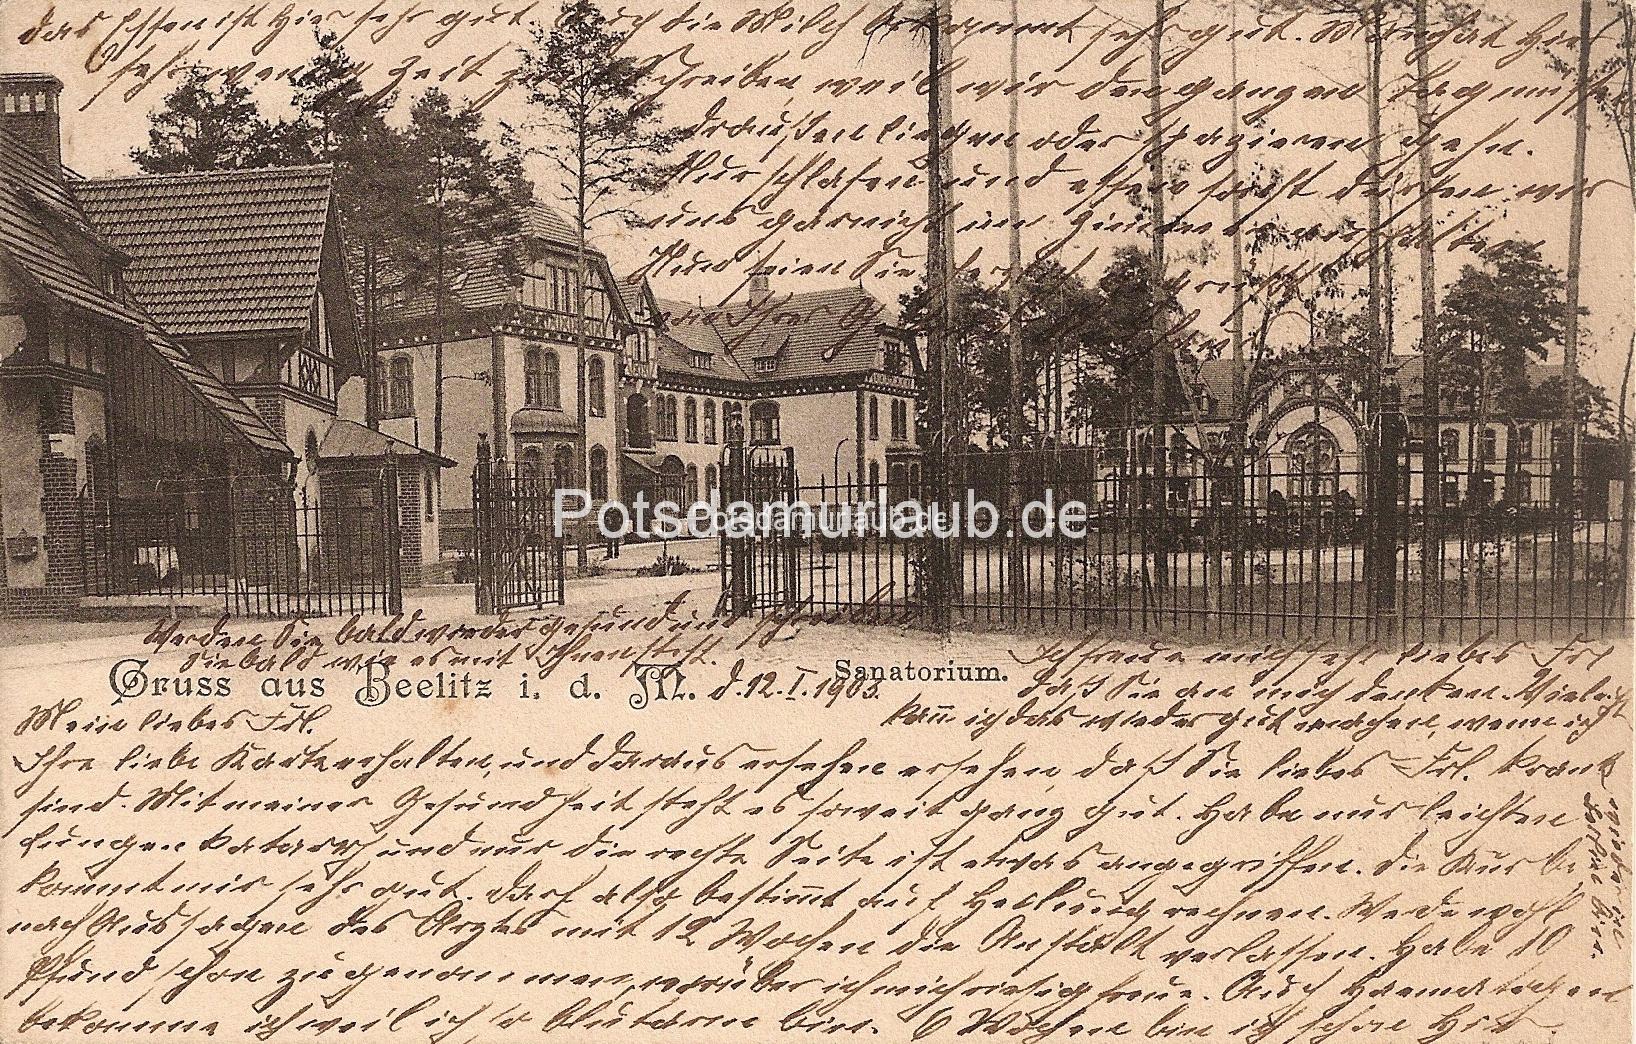 1903 01 12 v